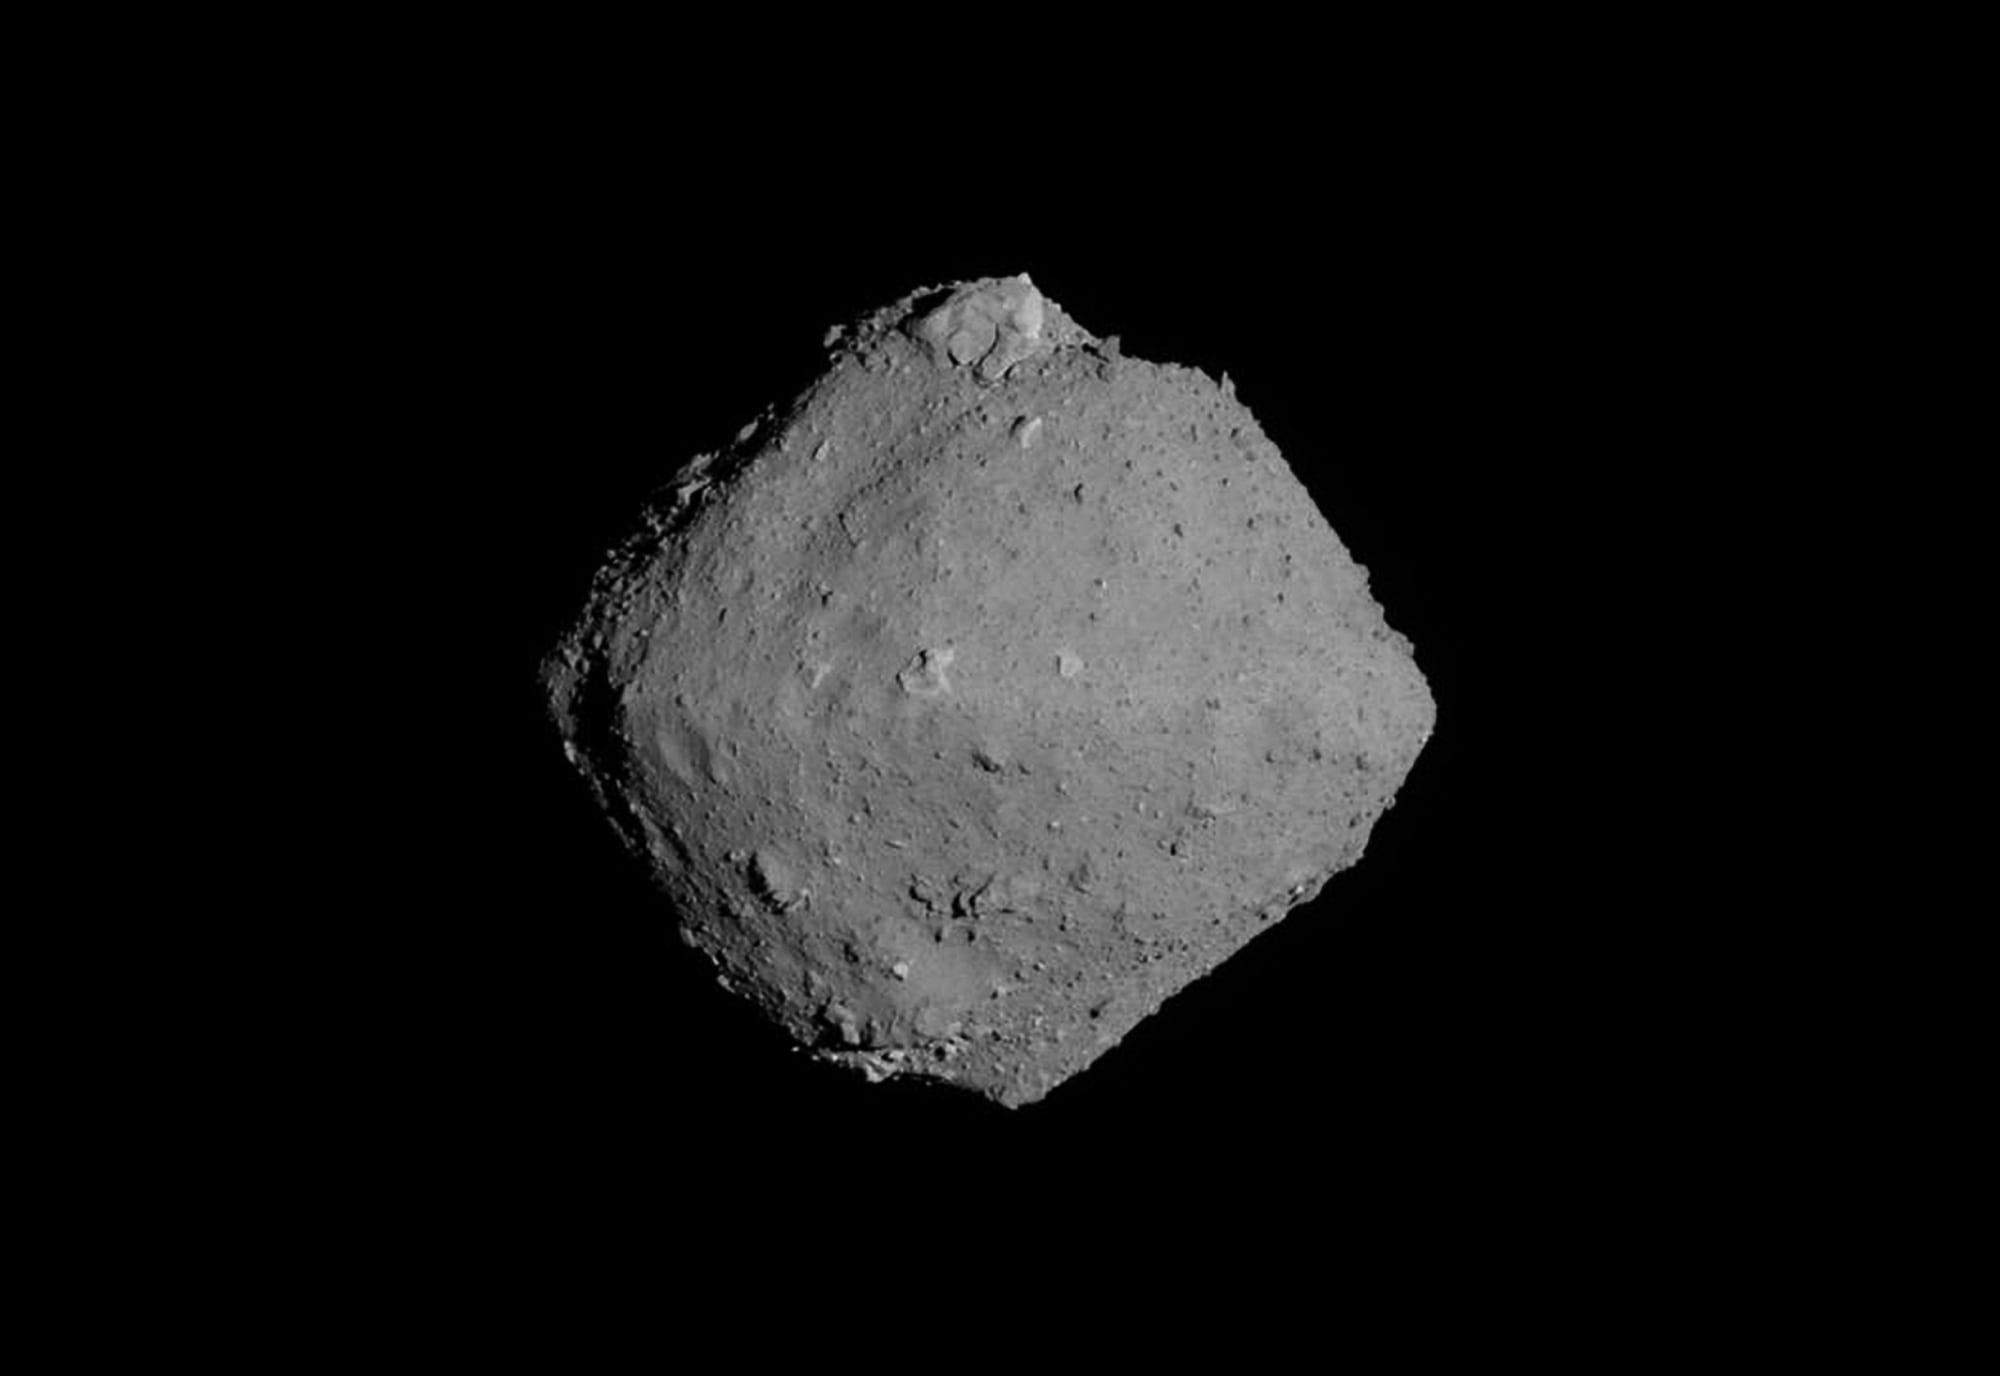 Asteroid (162173) Ryugu